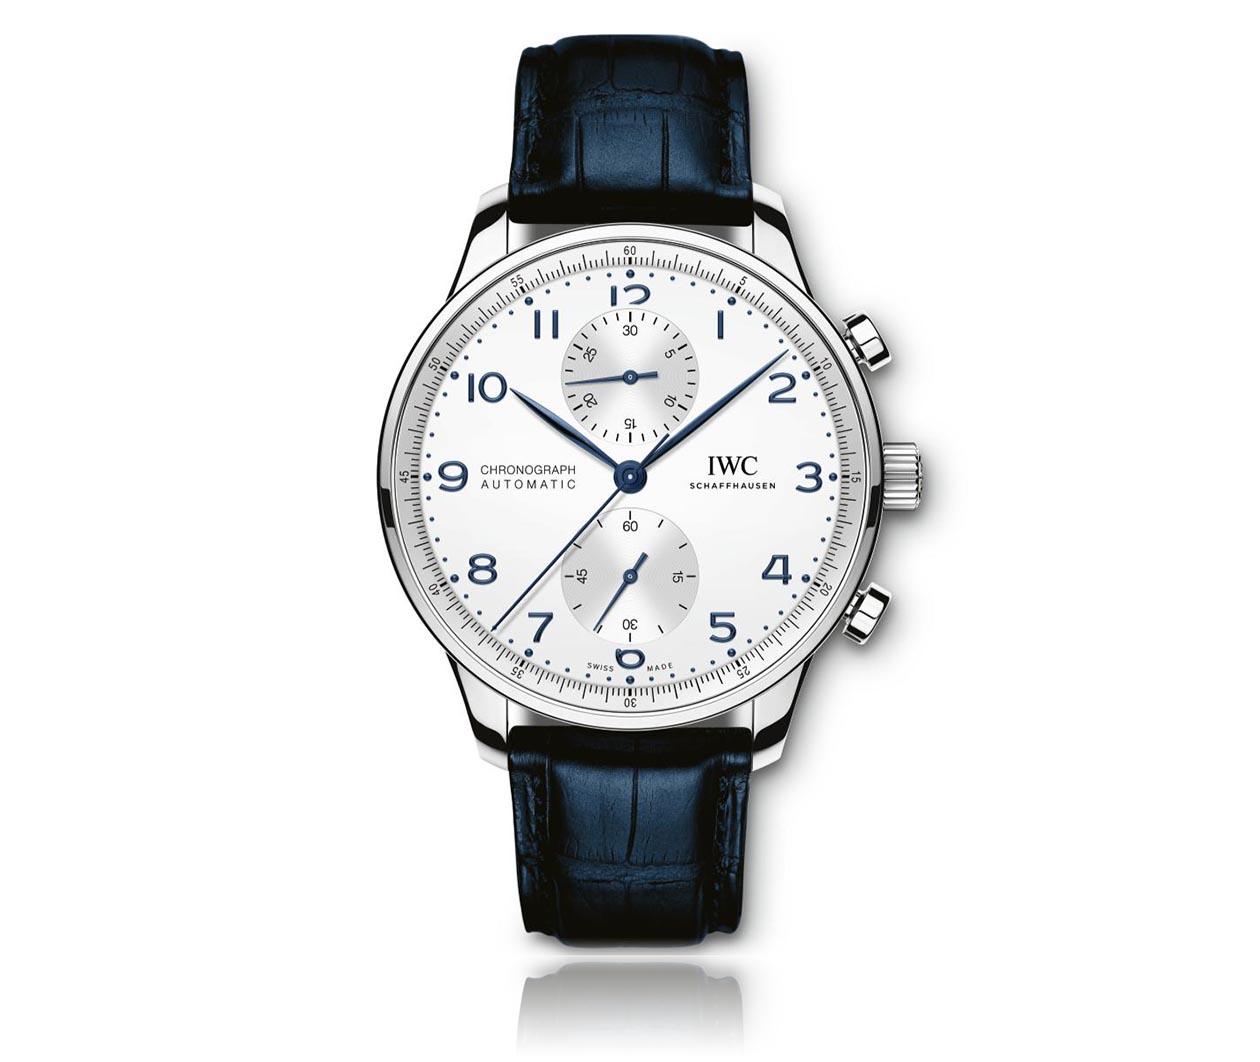 IWC Portugieser Chronograph IW371605 Carousel 1 FINAL